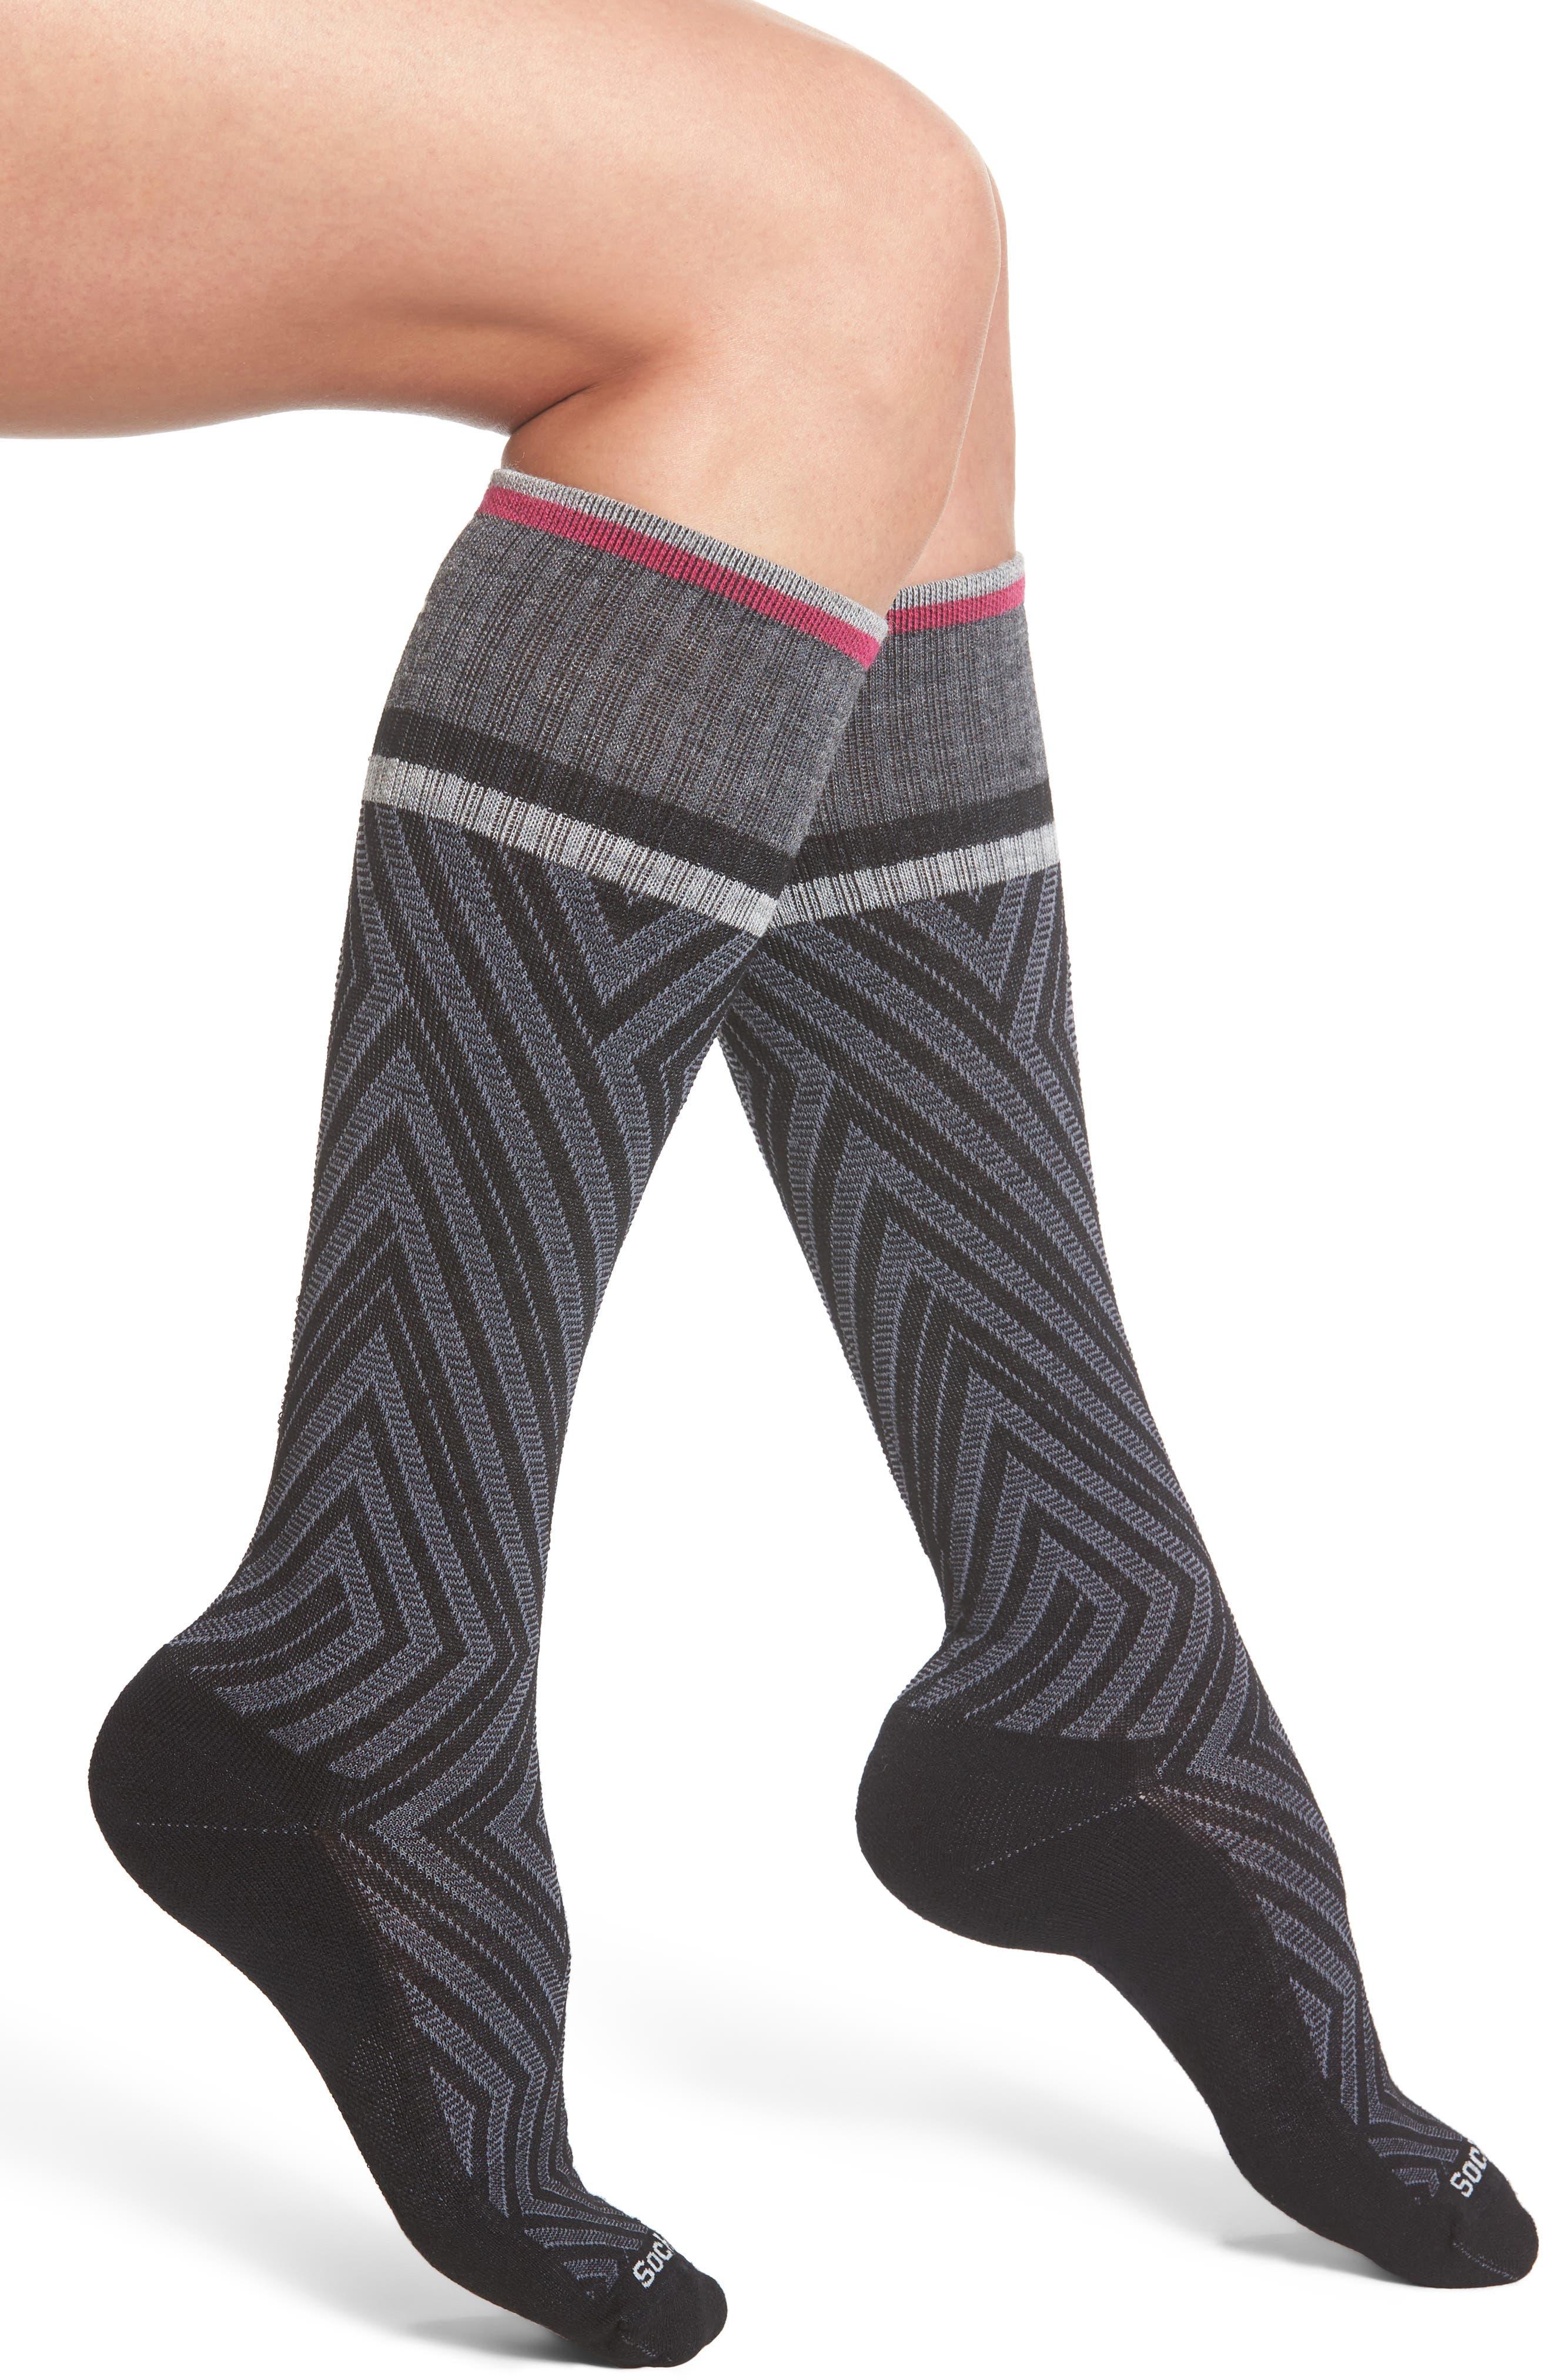 Labyrinth Graduated Compression Socks,                         Main,                         color, 001